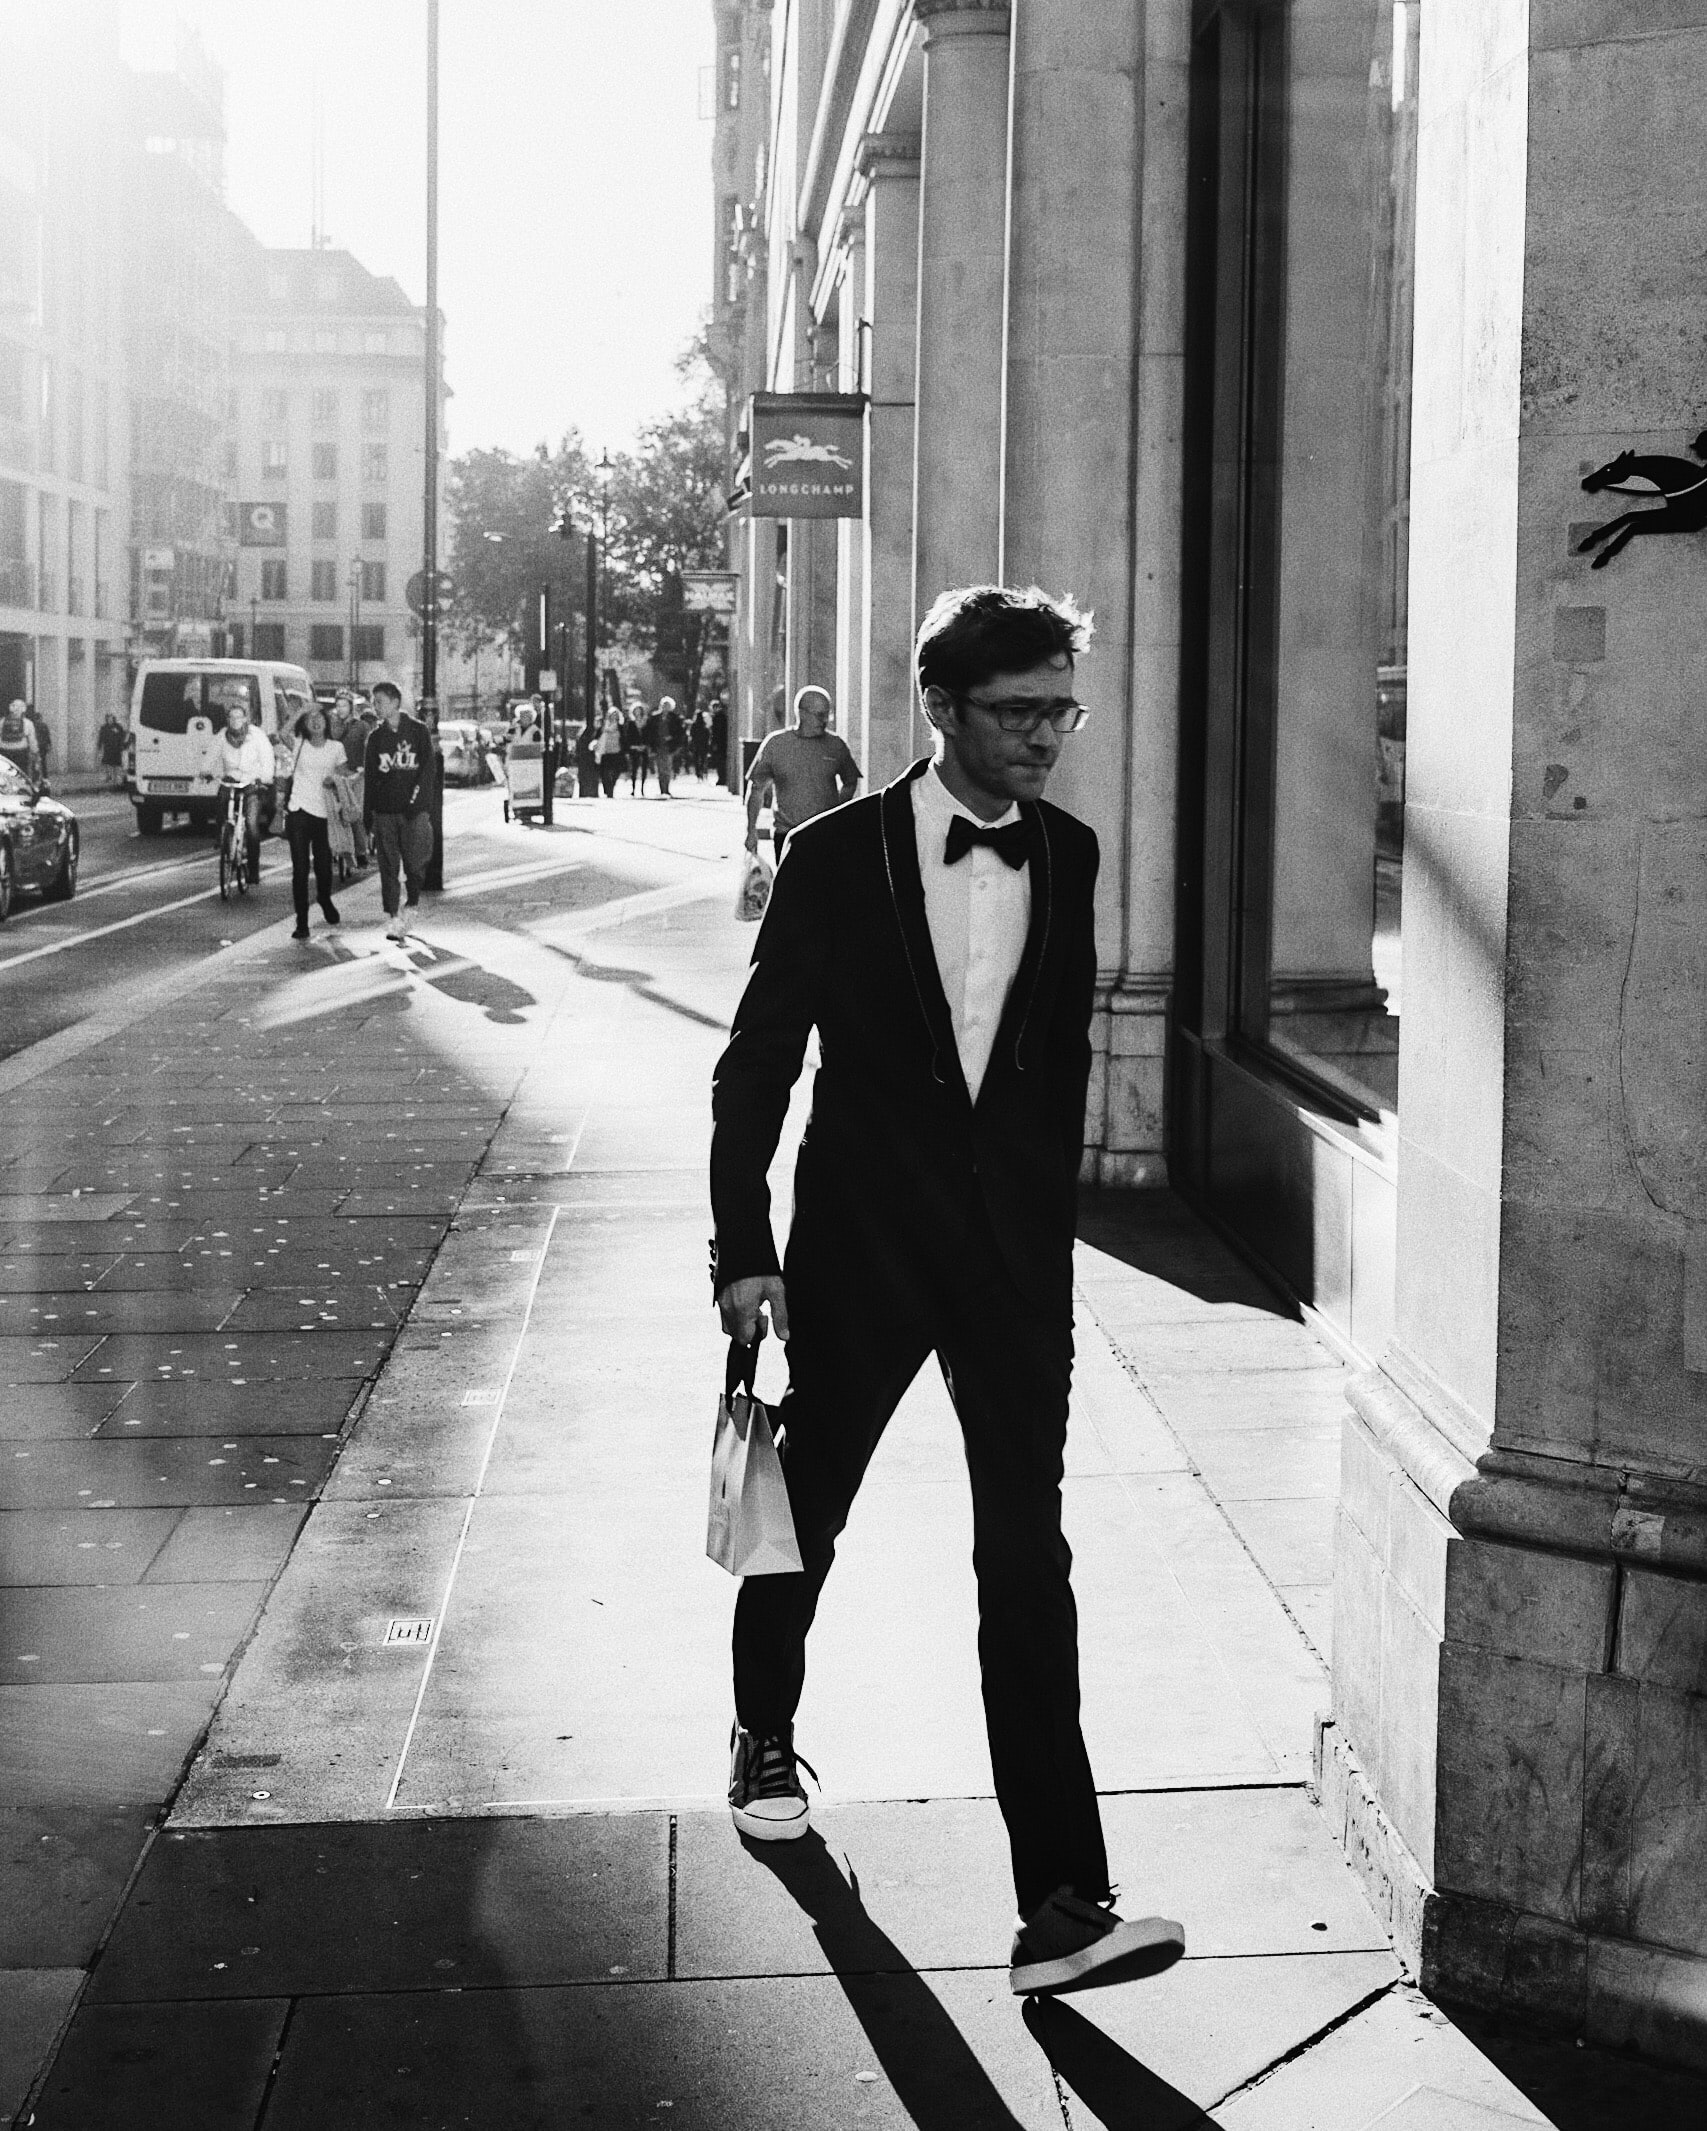 grayscale photo of man walking near concrete building